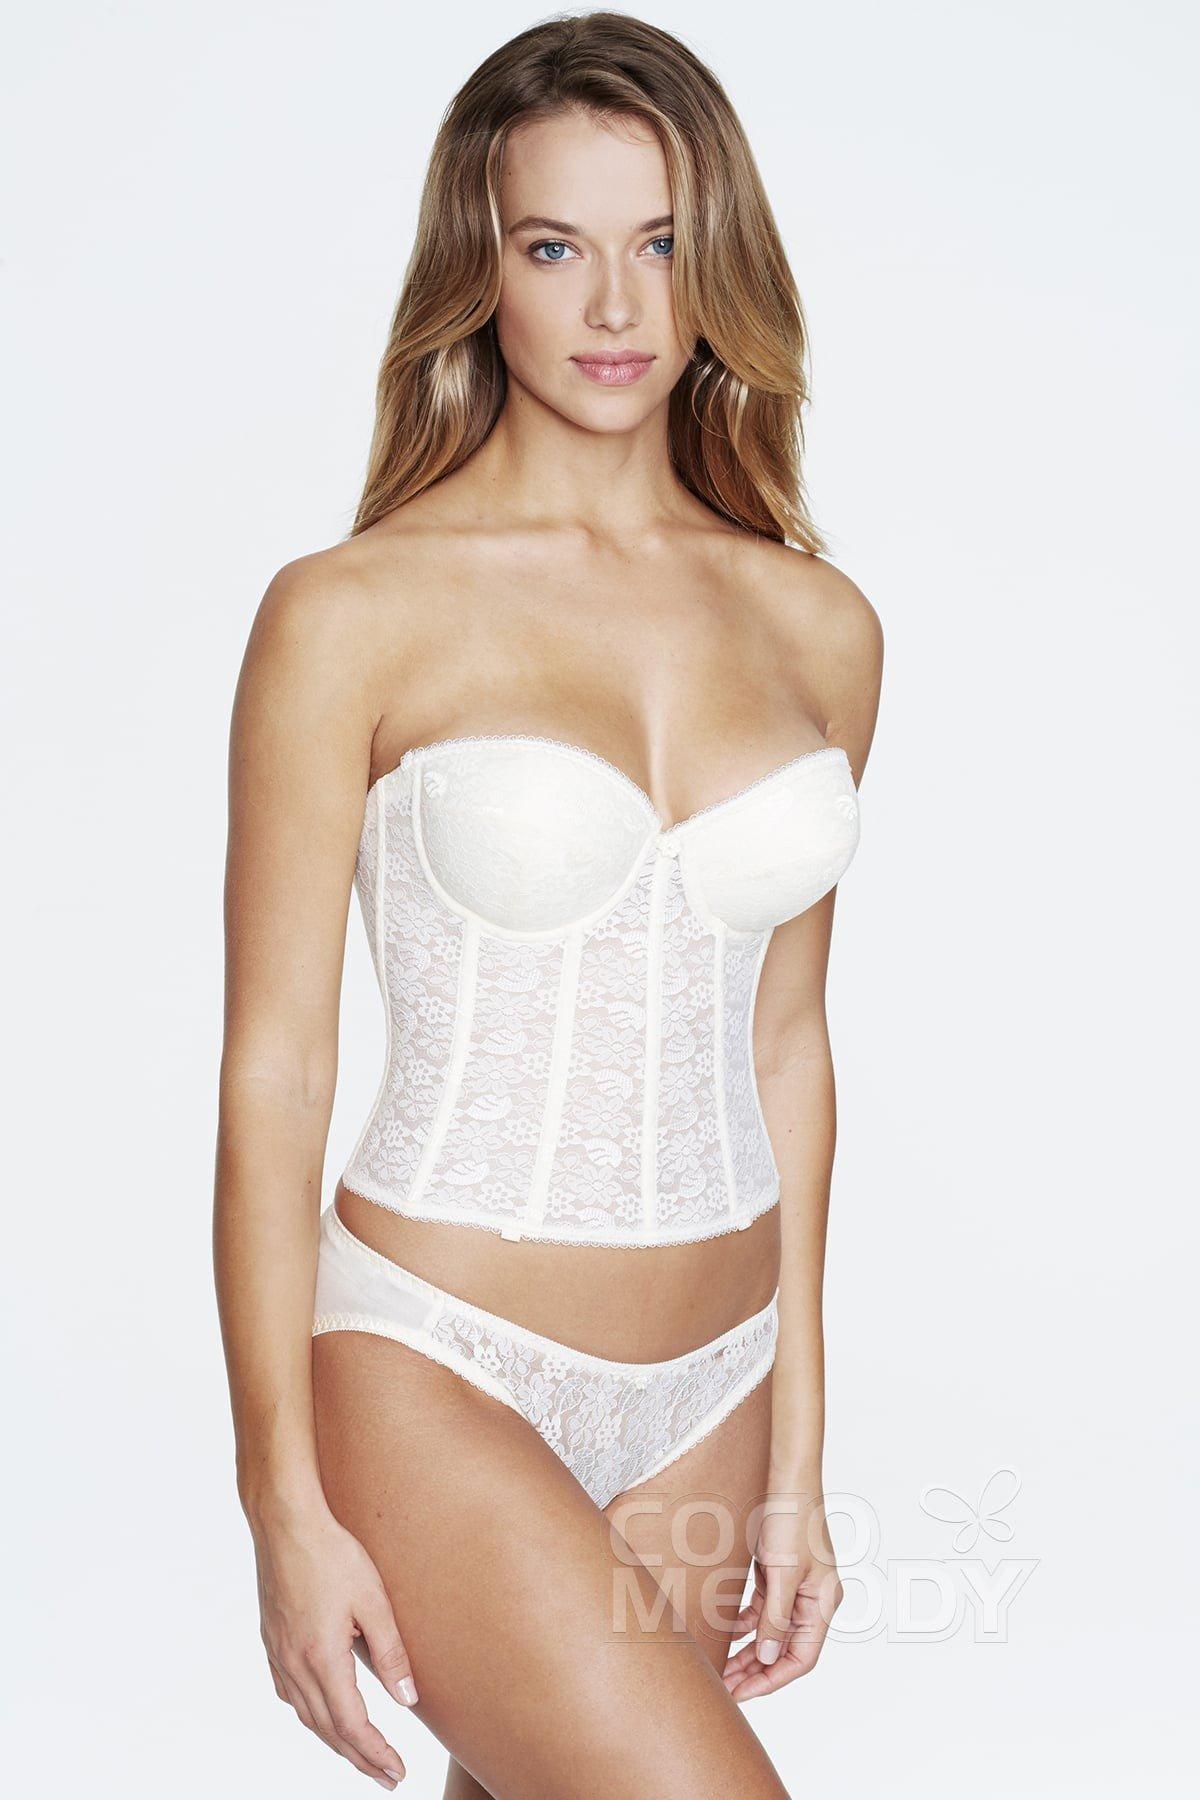 57c6181d2f166 Sweetheart Lace Corset Bridal Bra 7759